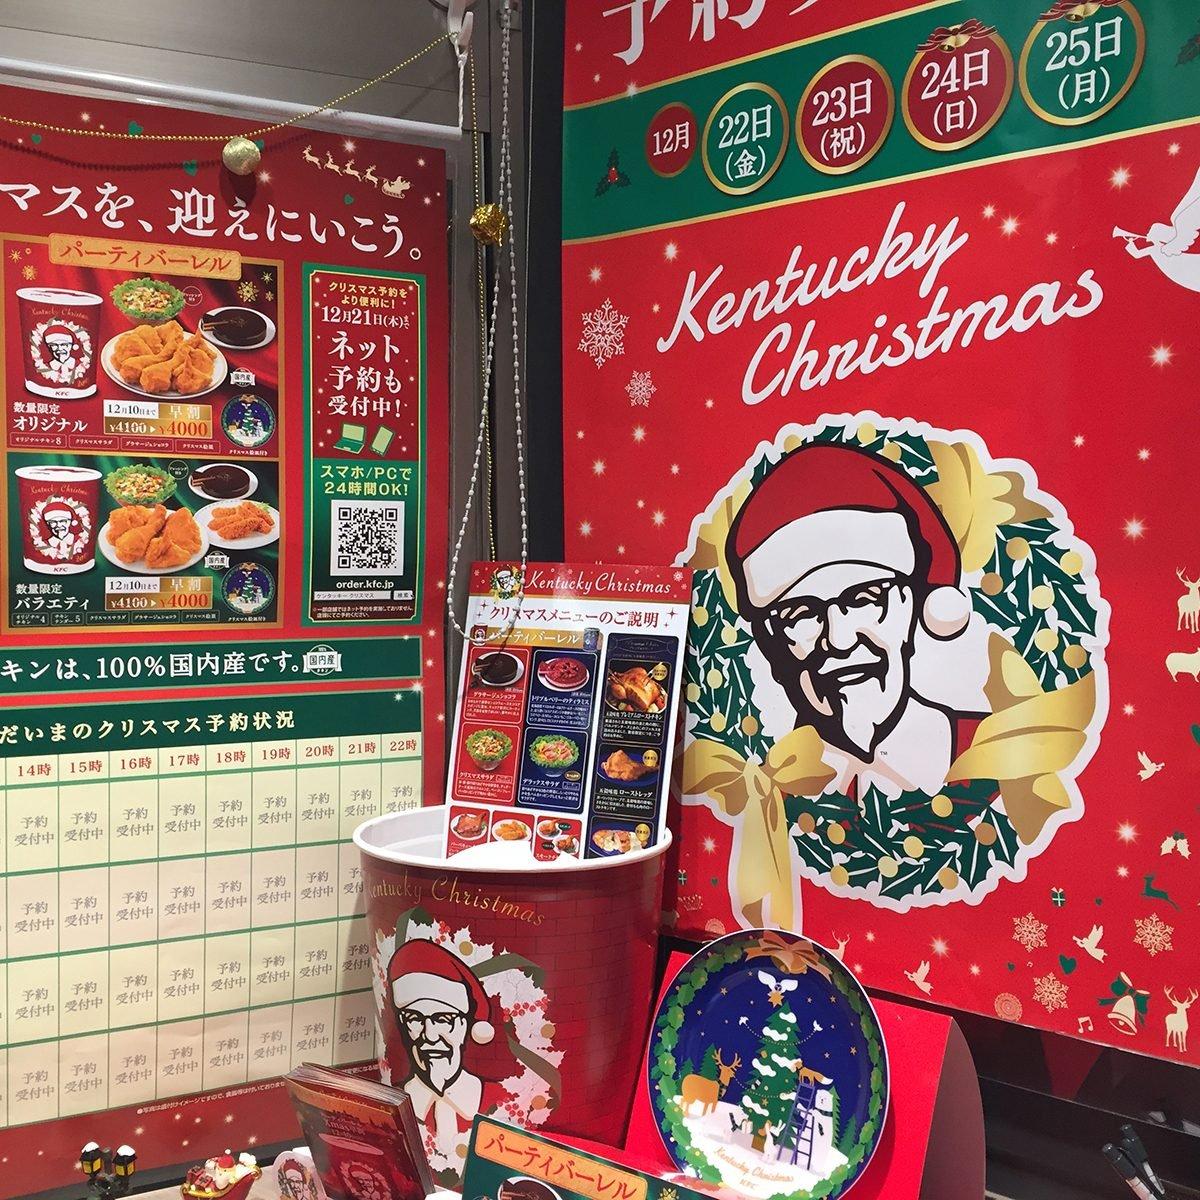 Ueno, Tokyo, Japan-November 16, 2017: KFC Kentucky Fried Chicken Christmas specials advertised in Tokyo. KFC is seen as traditional in Japan.